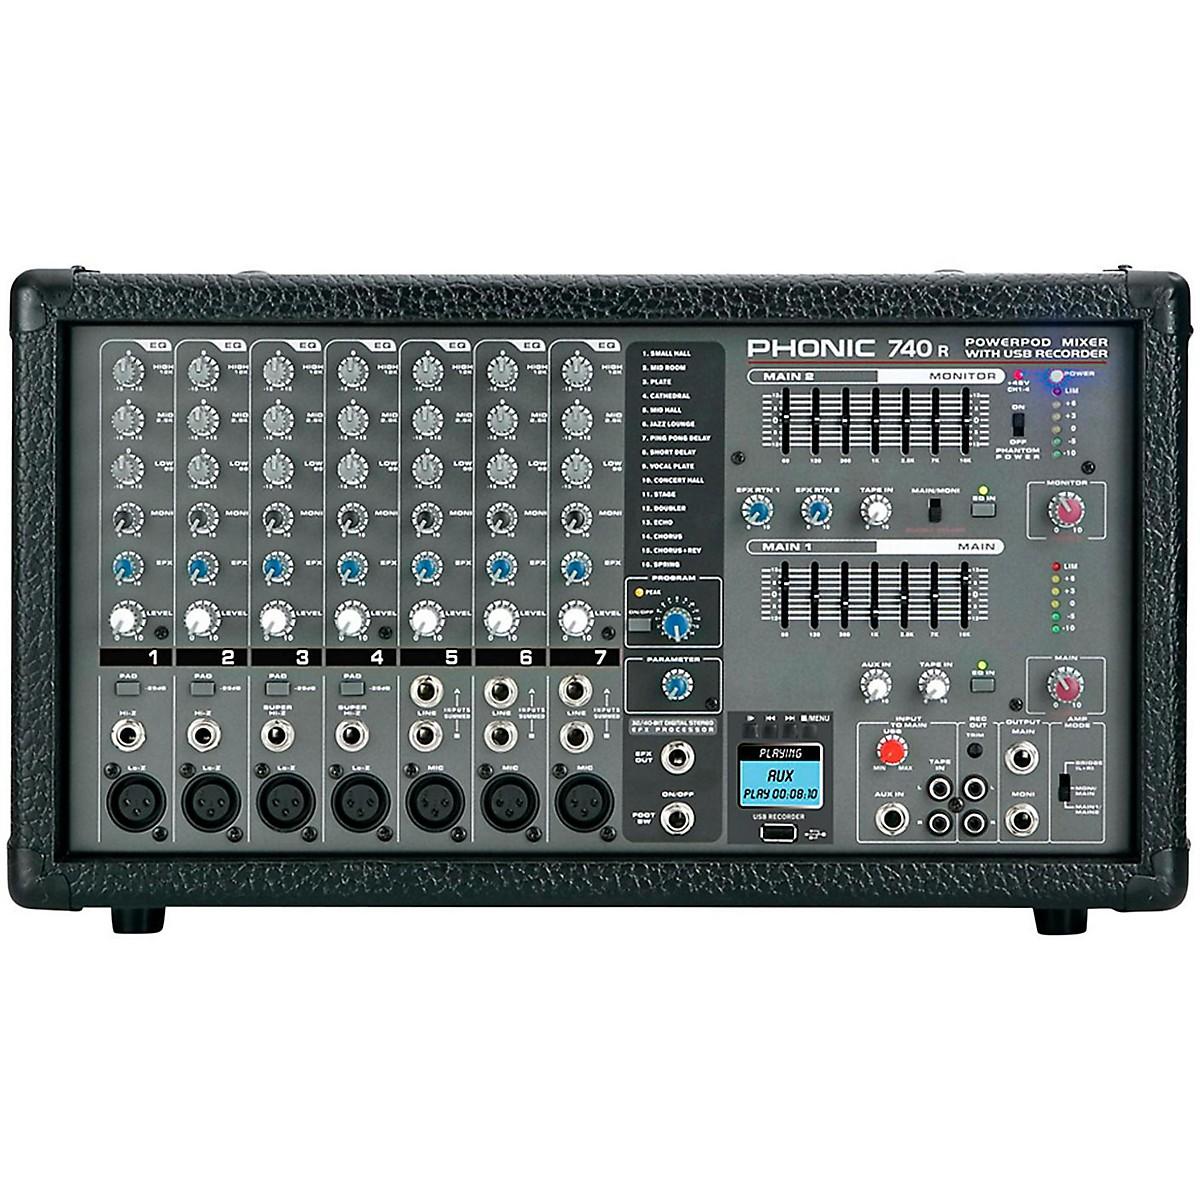 Phonic Powerpod 740 R Powered Mixer